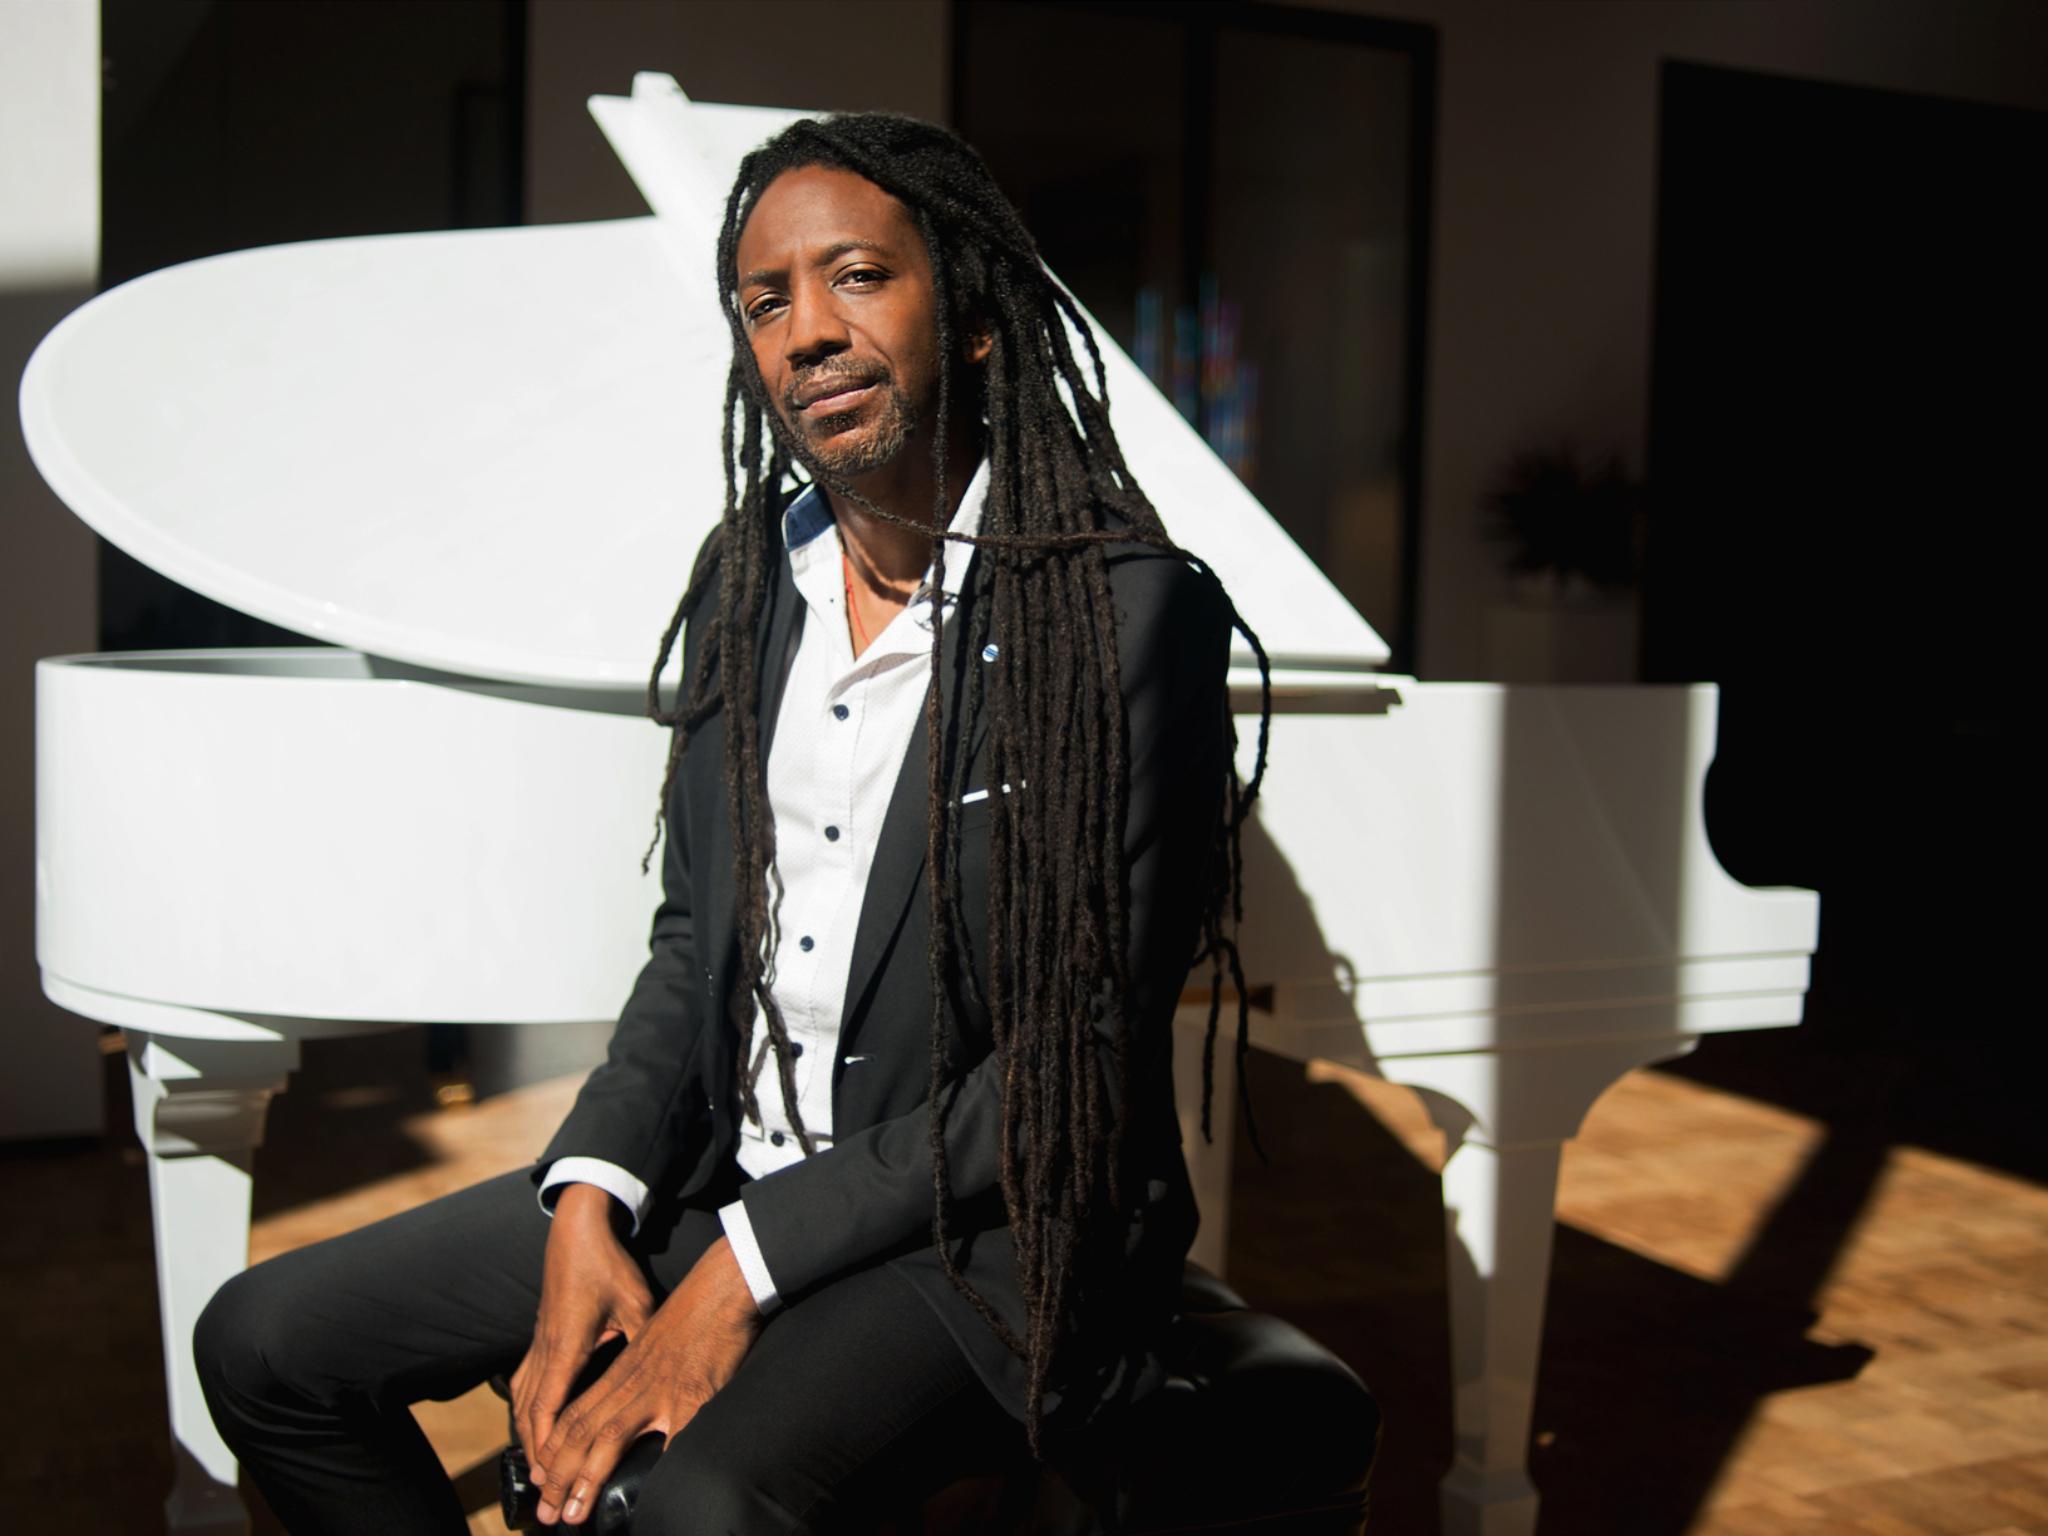 El festival NY Jazz All Stars 2020 se suma a las iniciativas en streaming